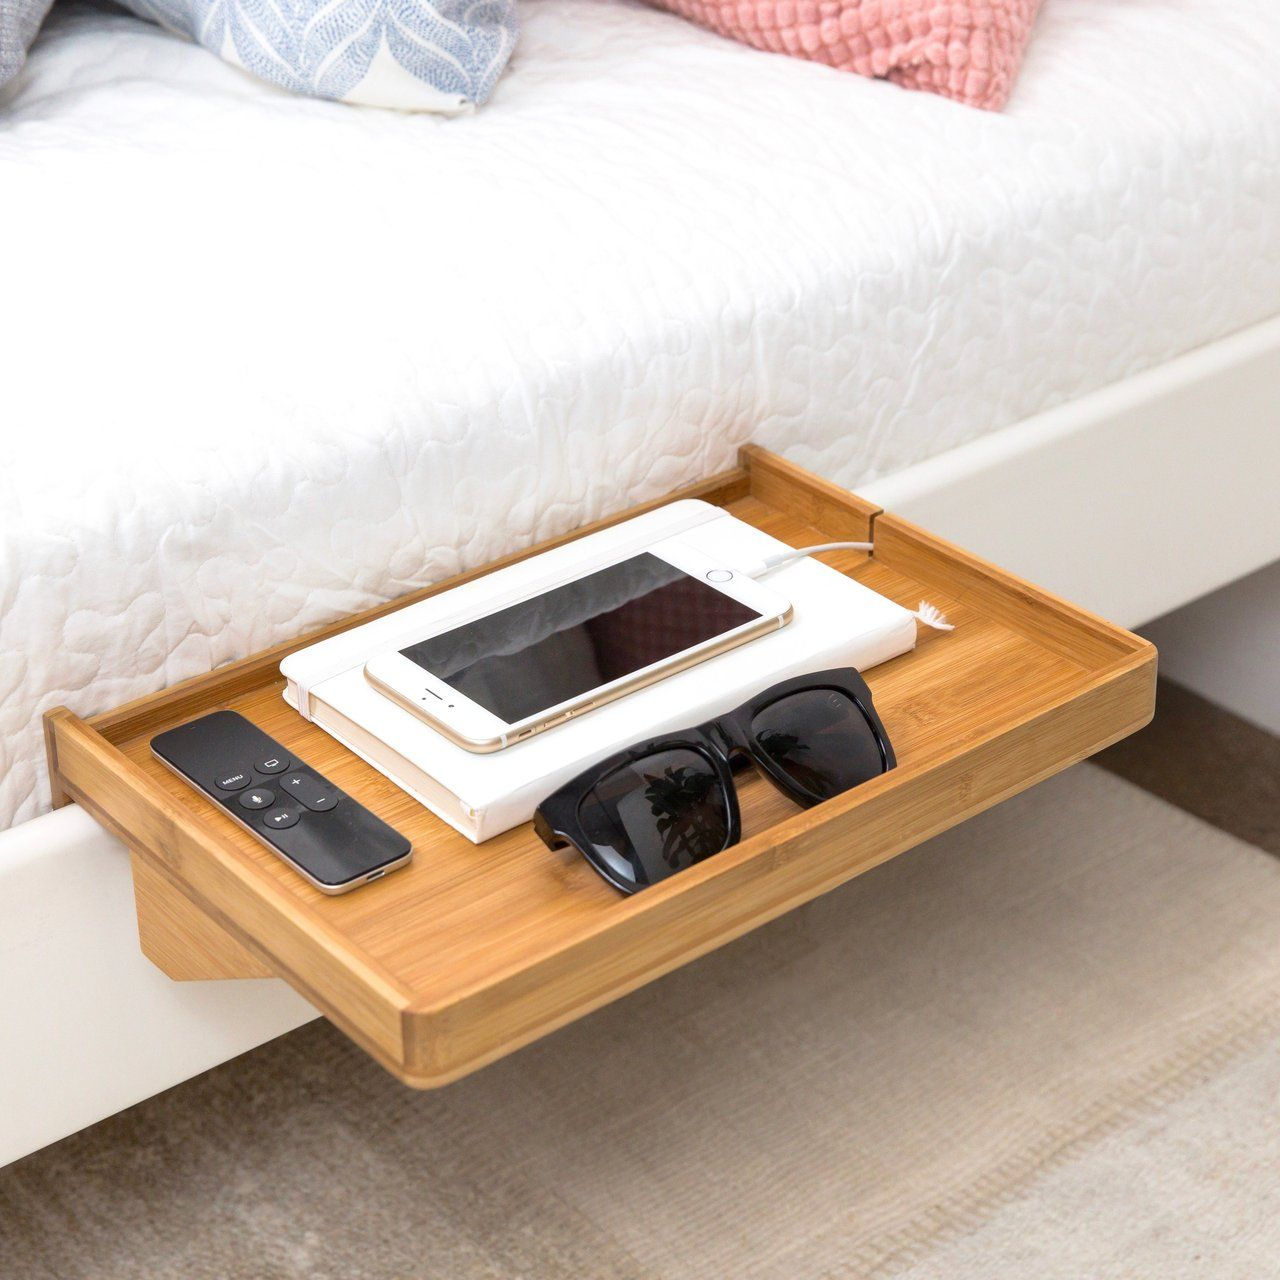 Loft bed organization ideas  BedShelfie Minimalist Nightstand minimalistic nightstand shelf